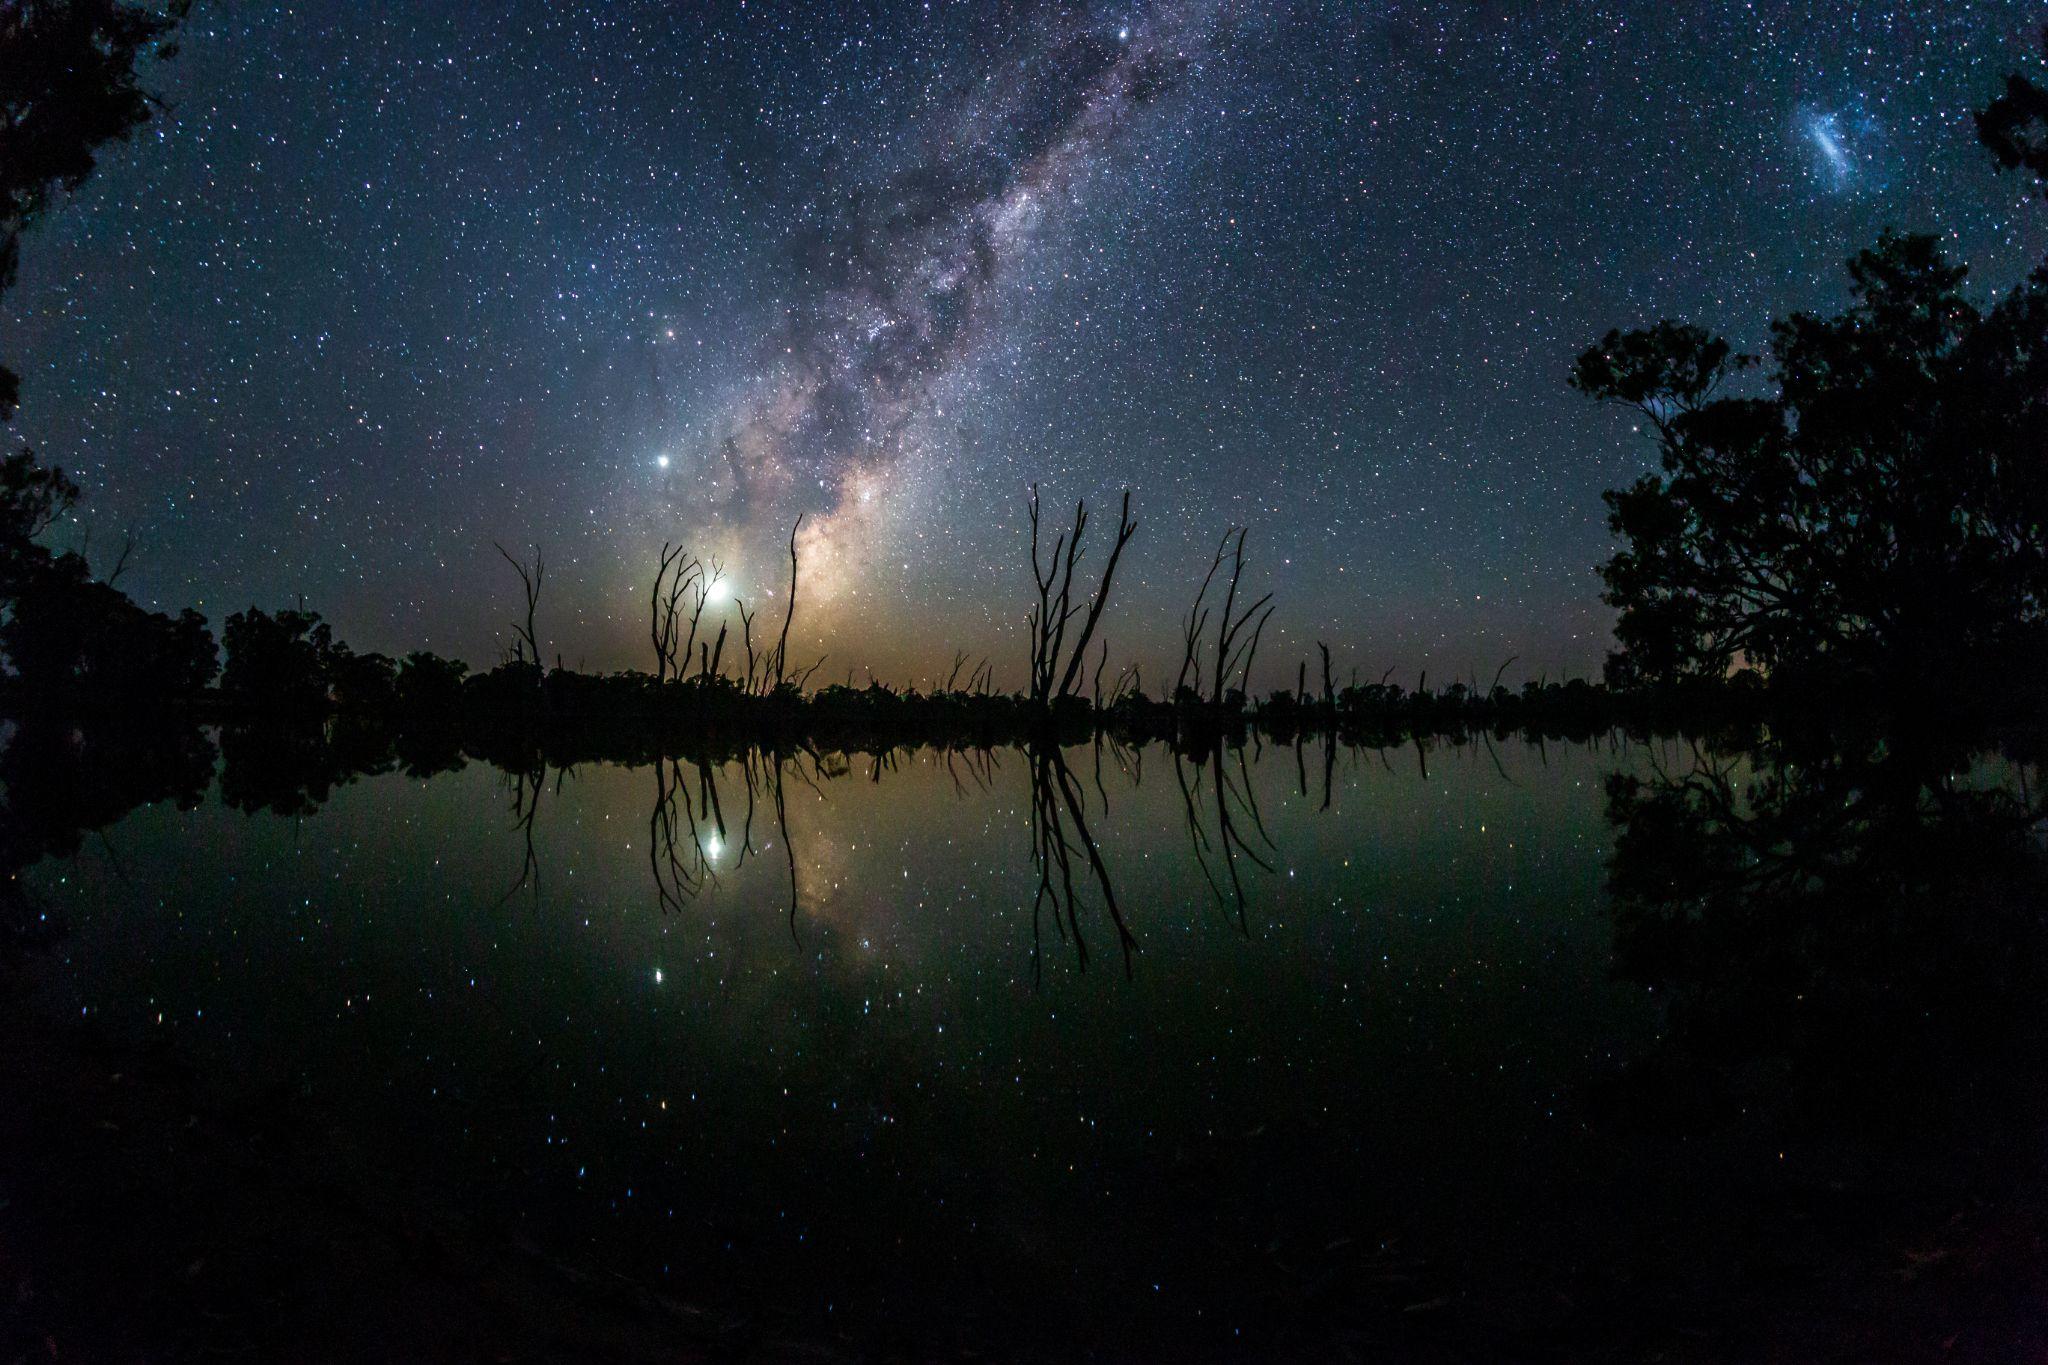 Earth Day 2019 Mulligan-swamp-south-australia-milky-way-Feb2019